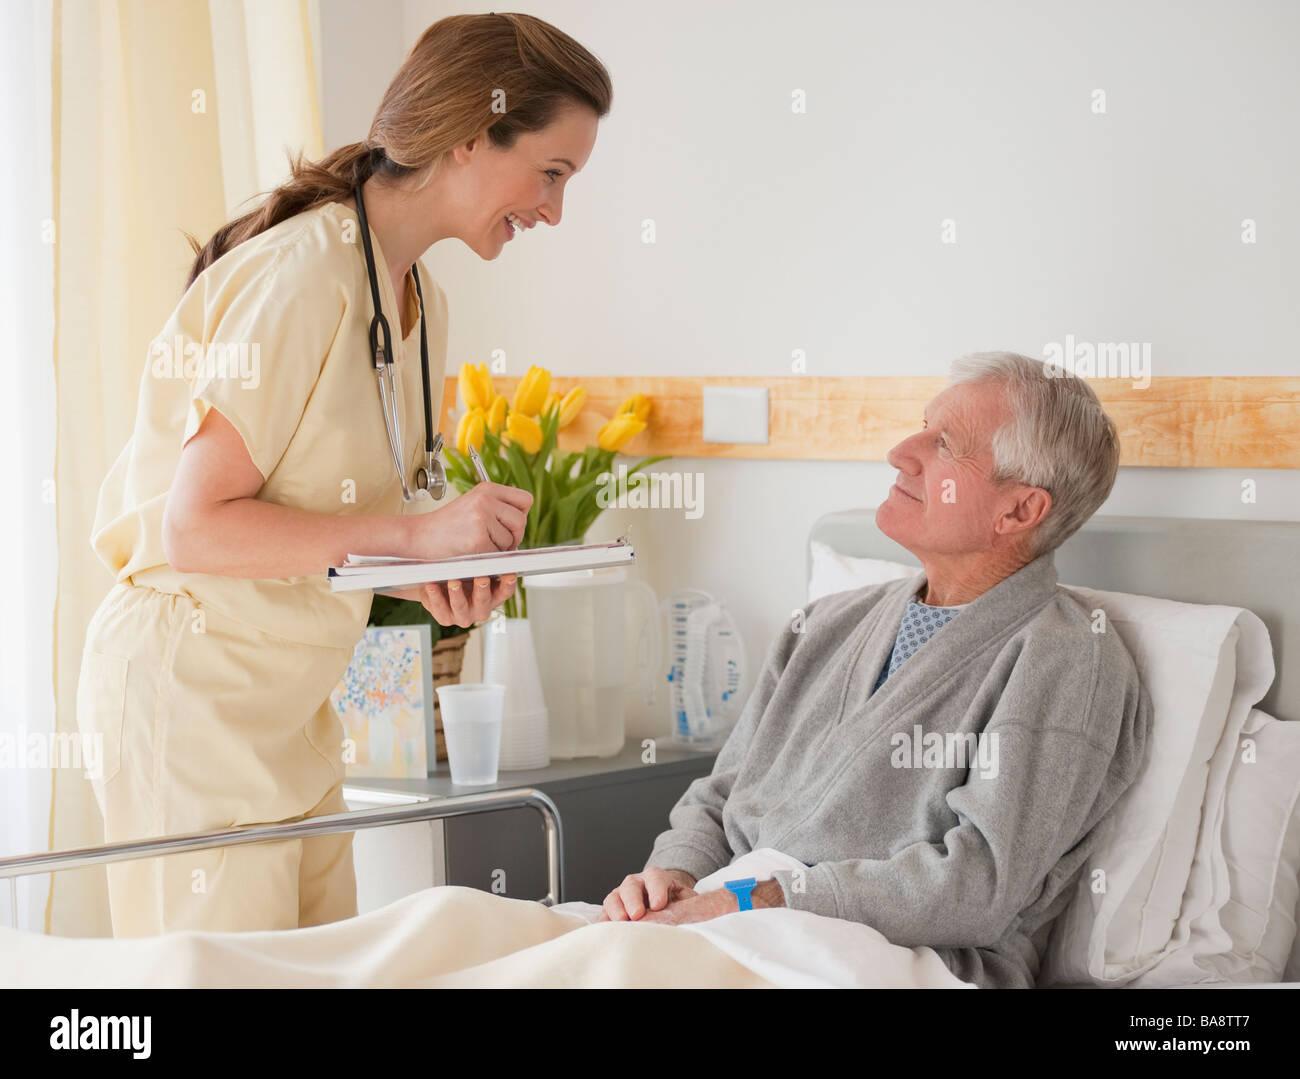 Nurse caring for senior man in hospital - Stock Image